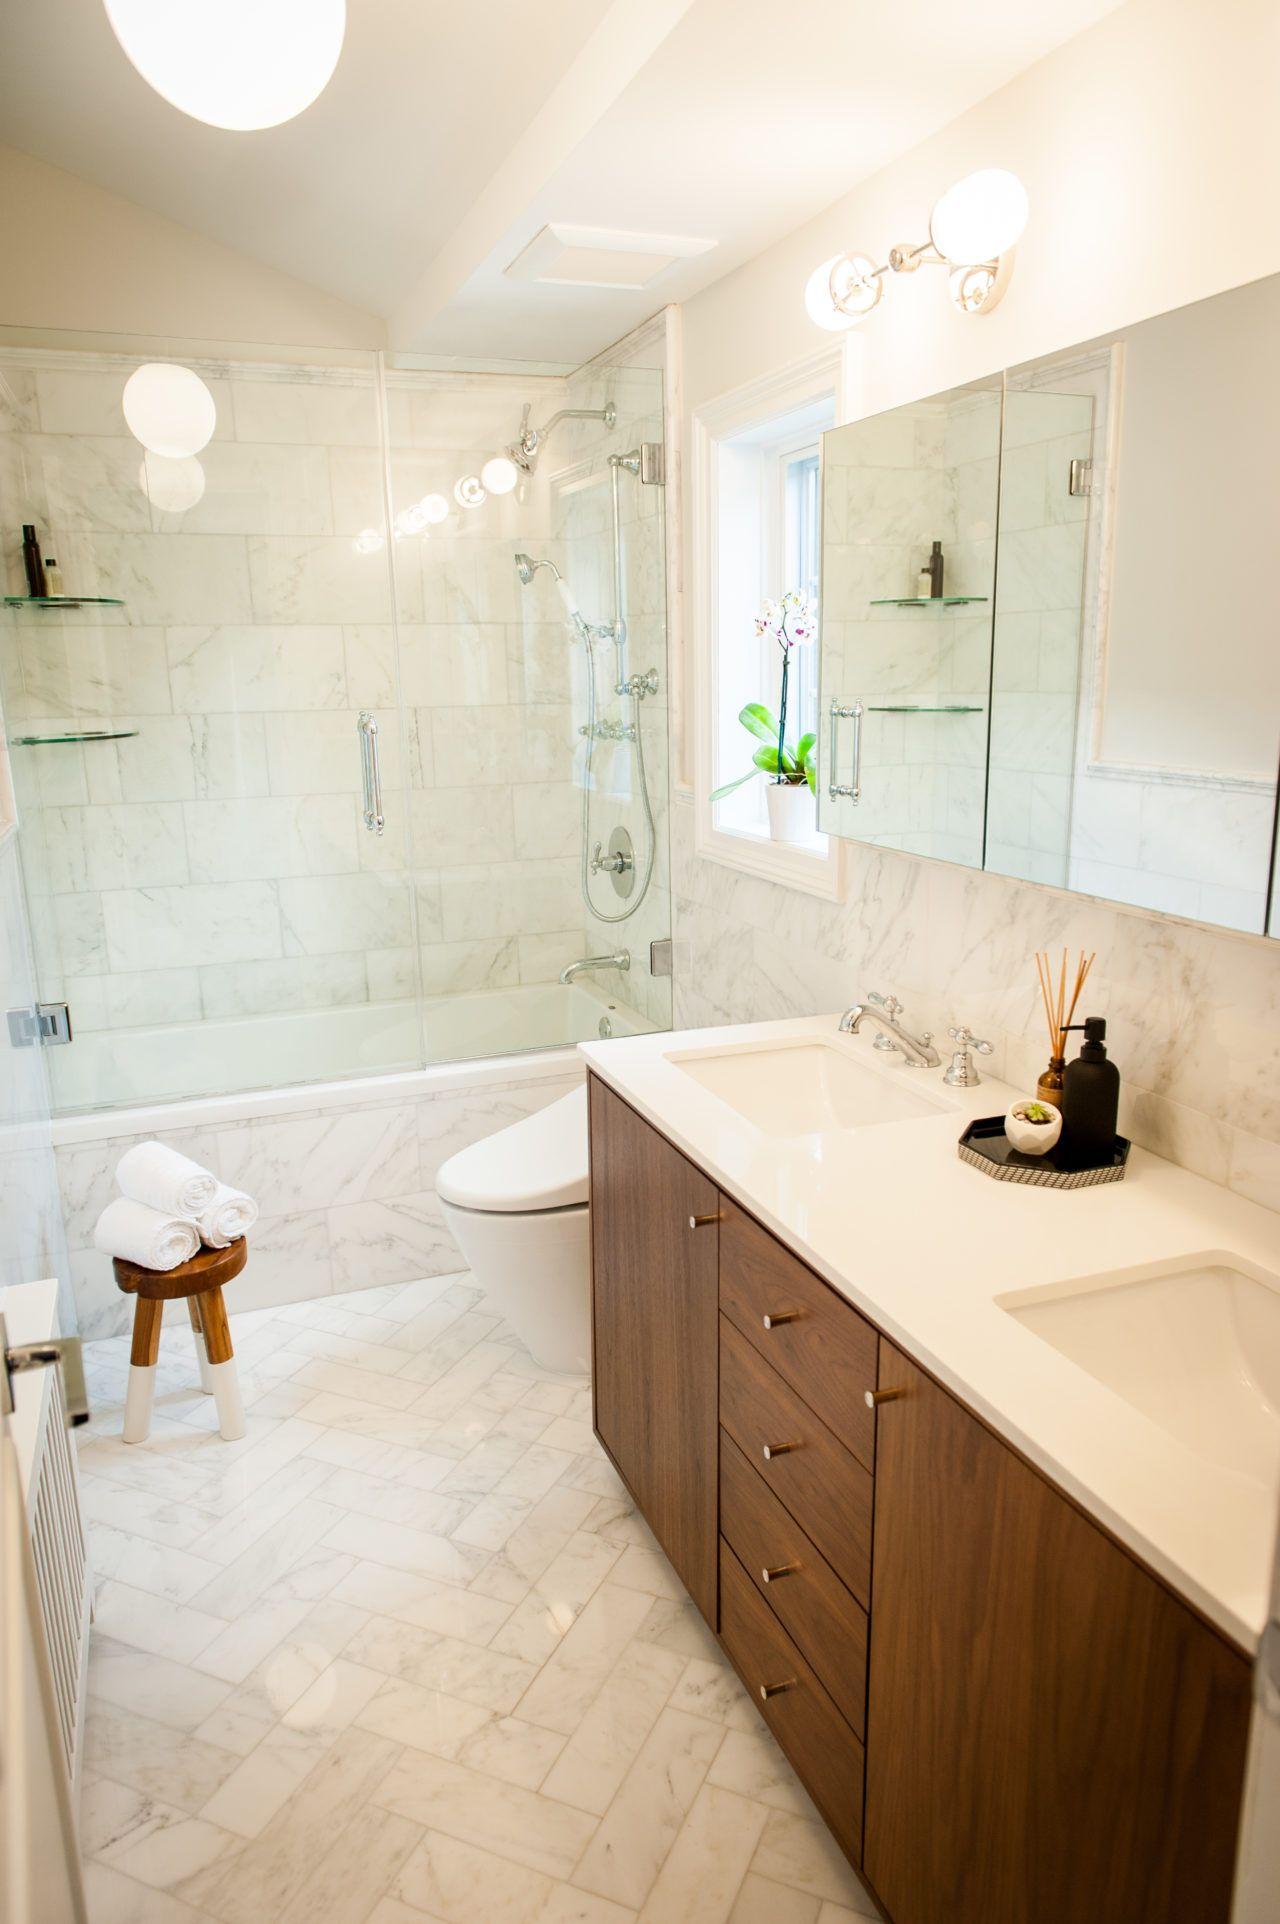 Annashouse 7 Of 12160801 1280x1924 Jpg 1 280 1 924 Pixels Bathroom Remodel Cost Bathroom Renovations Bathrooms Remodel